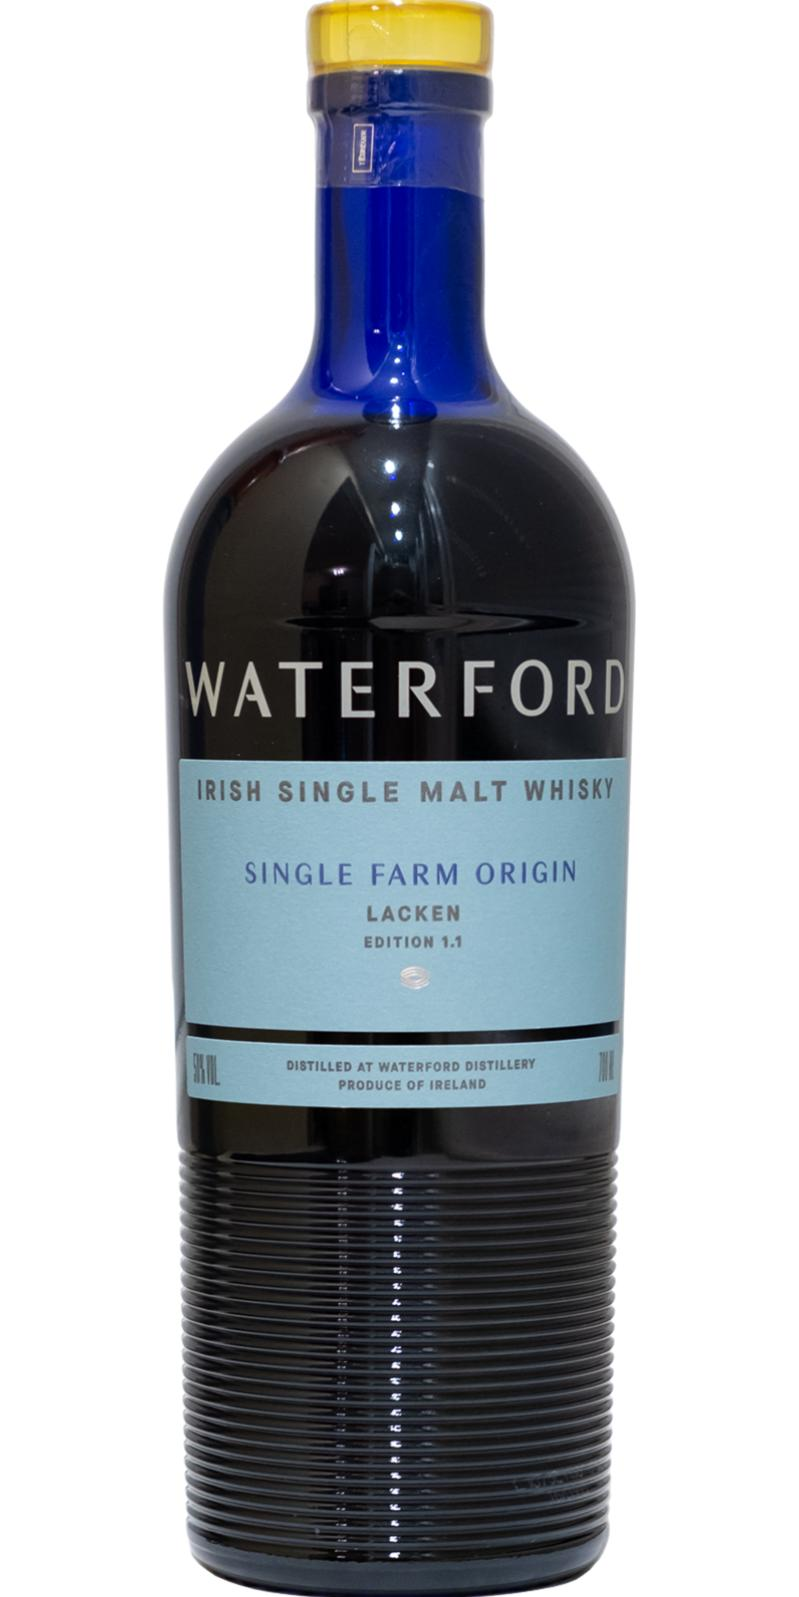 Waterford Lacken: Edition 1.1